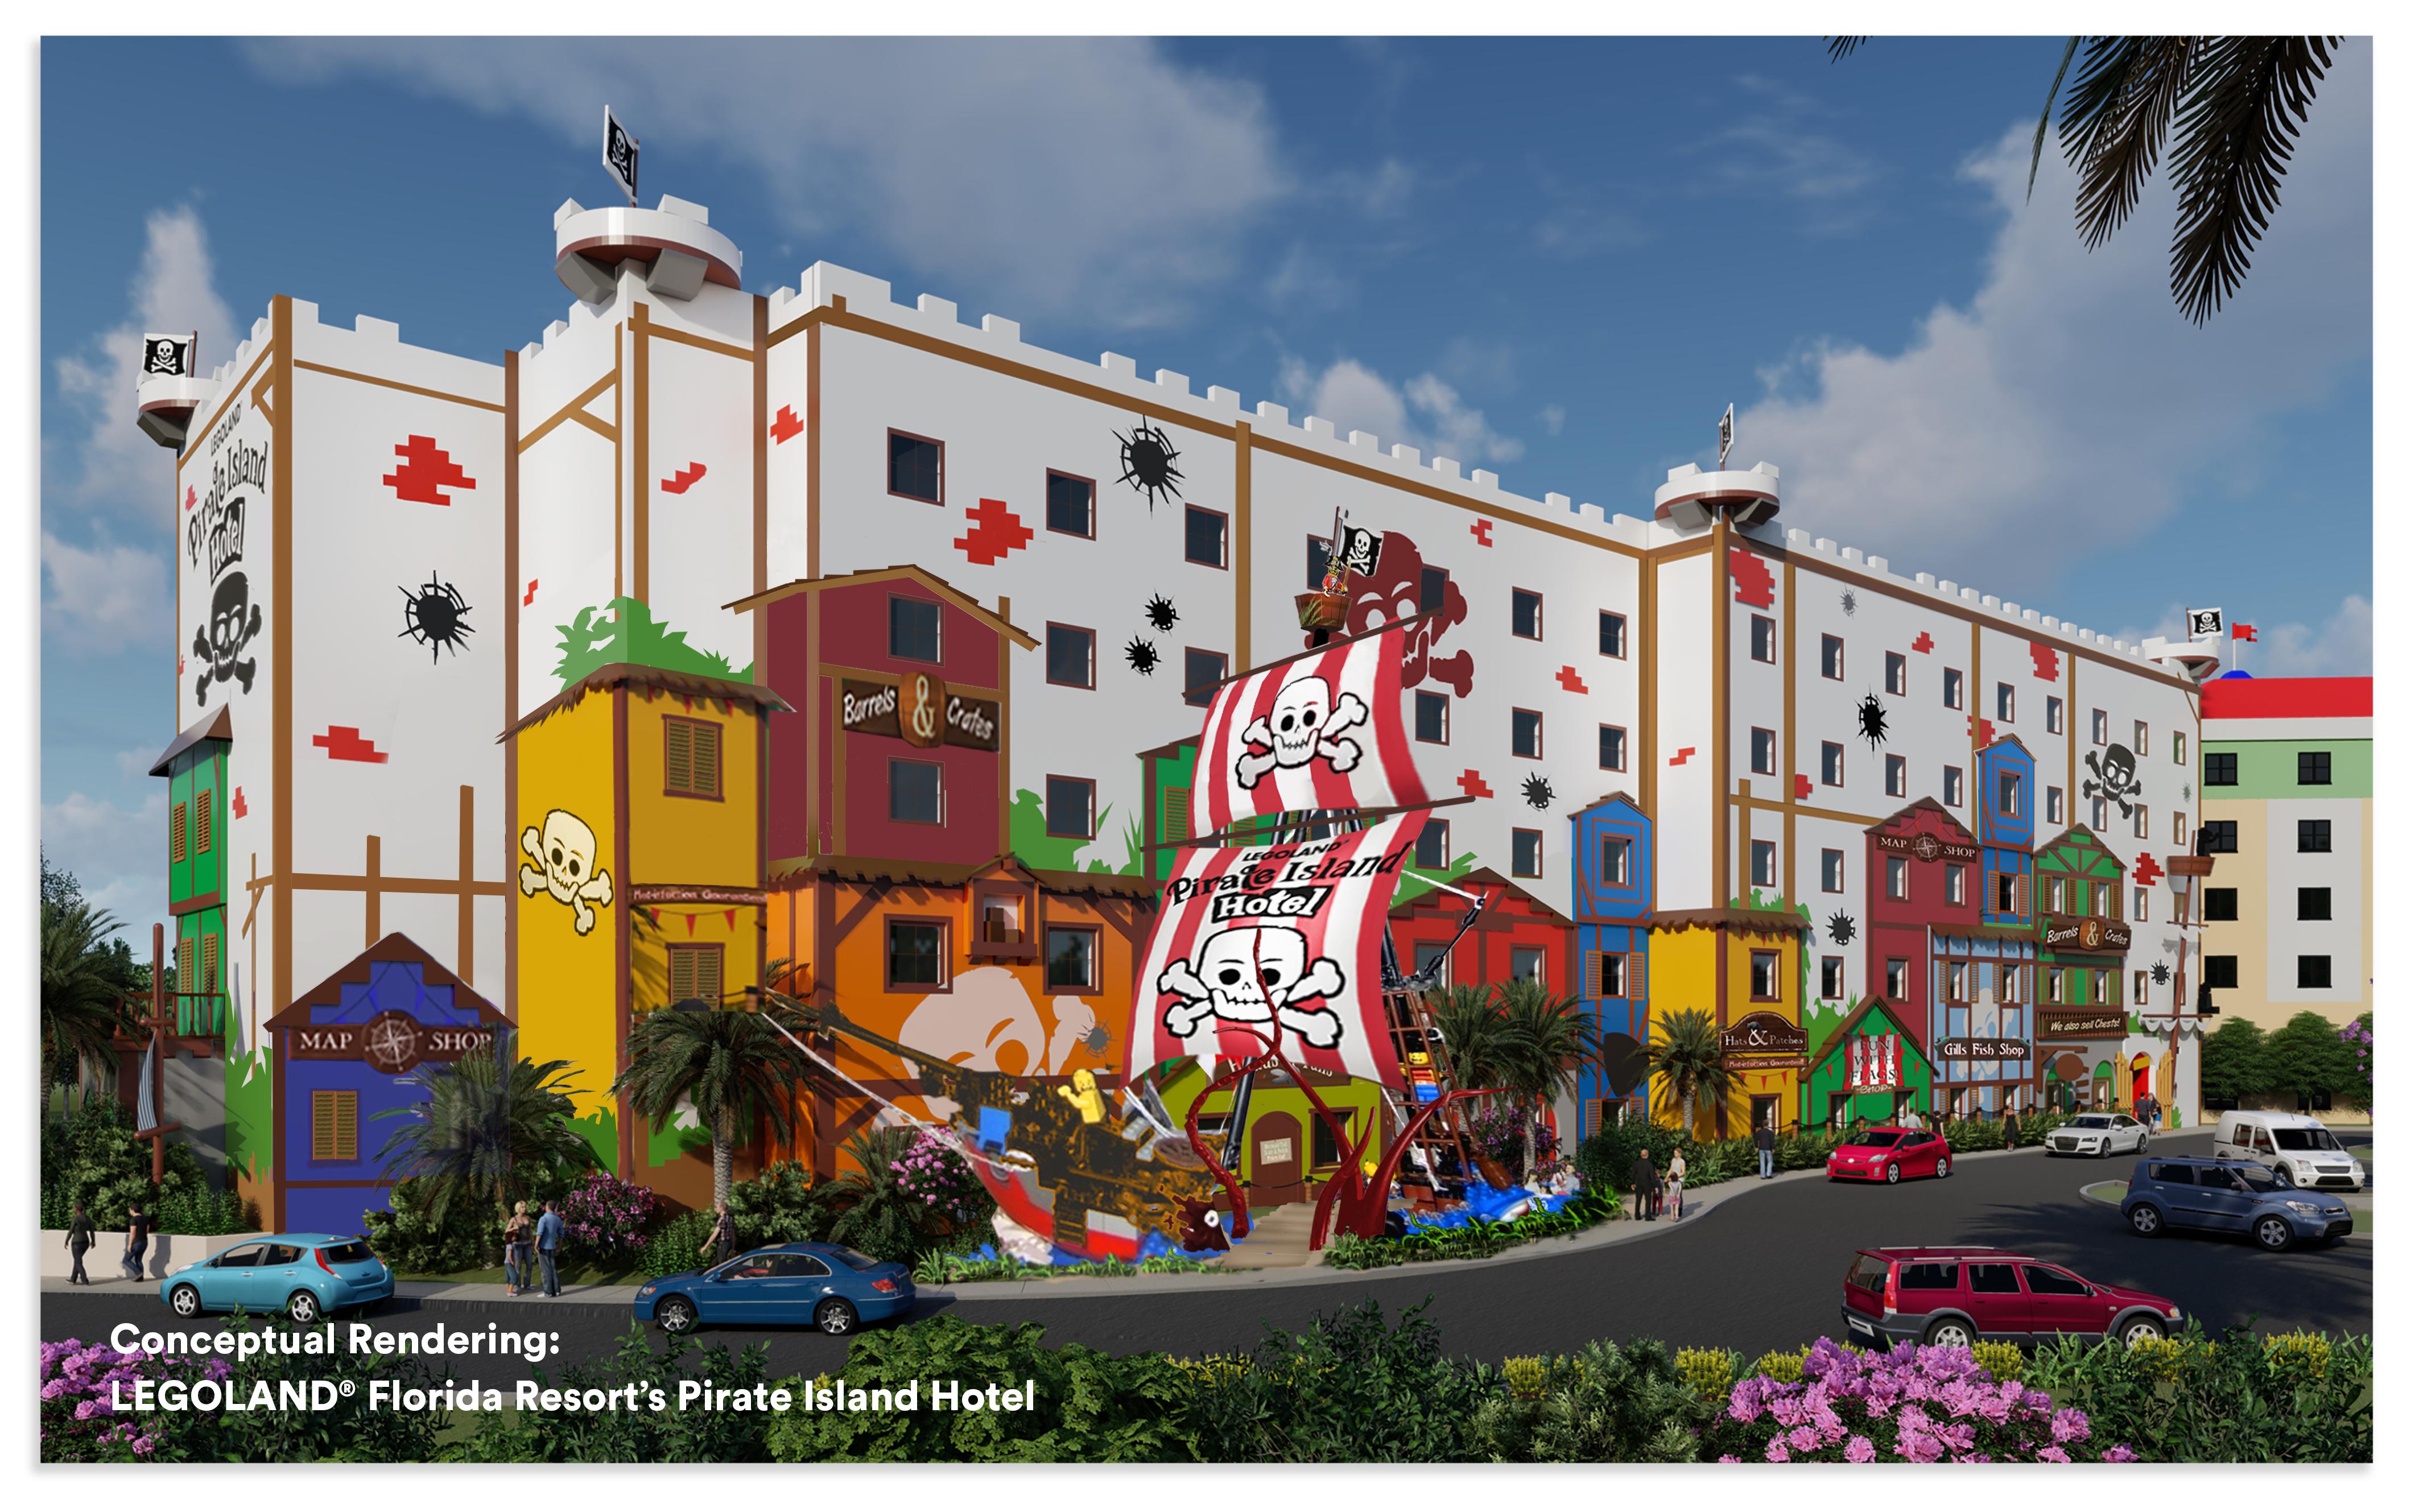 LEGOLAND Florida Resort inaugurará el Pirate Island Hotel ...